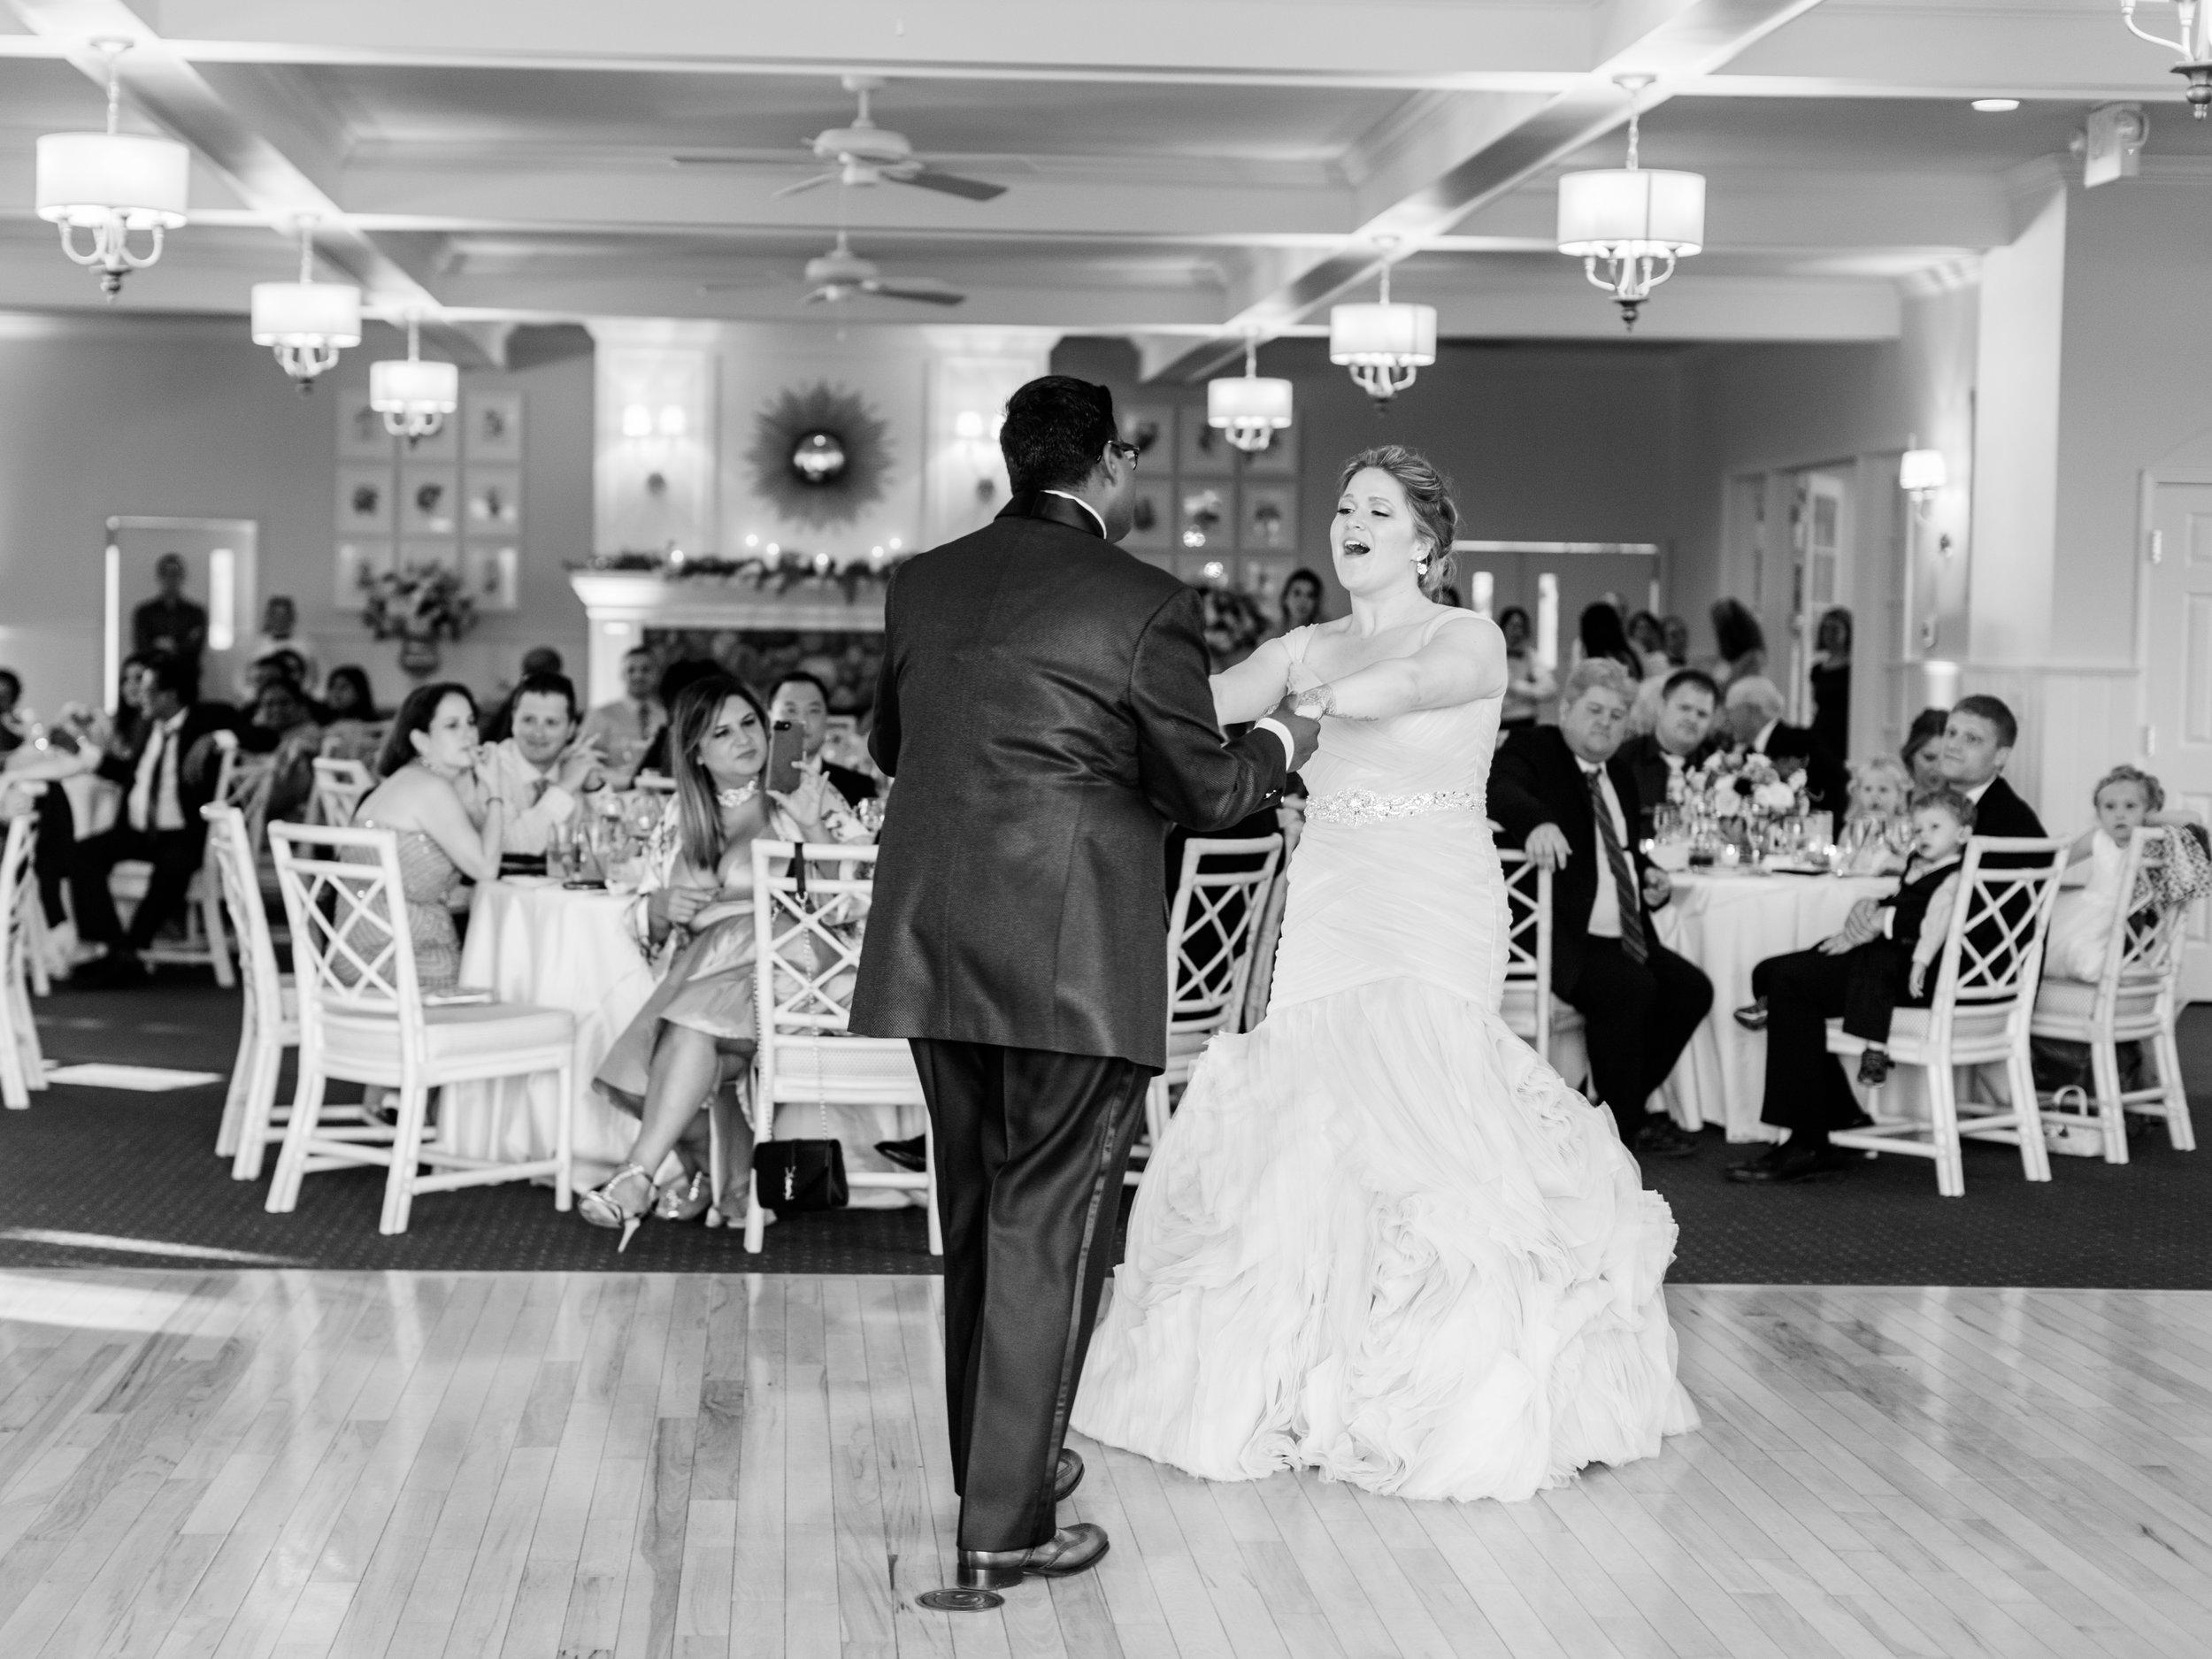 Govathoti+Wedding+Reception+BGFirst Dance-29.jpg